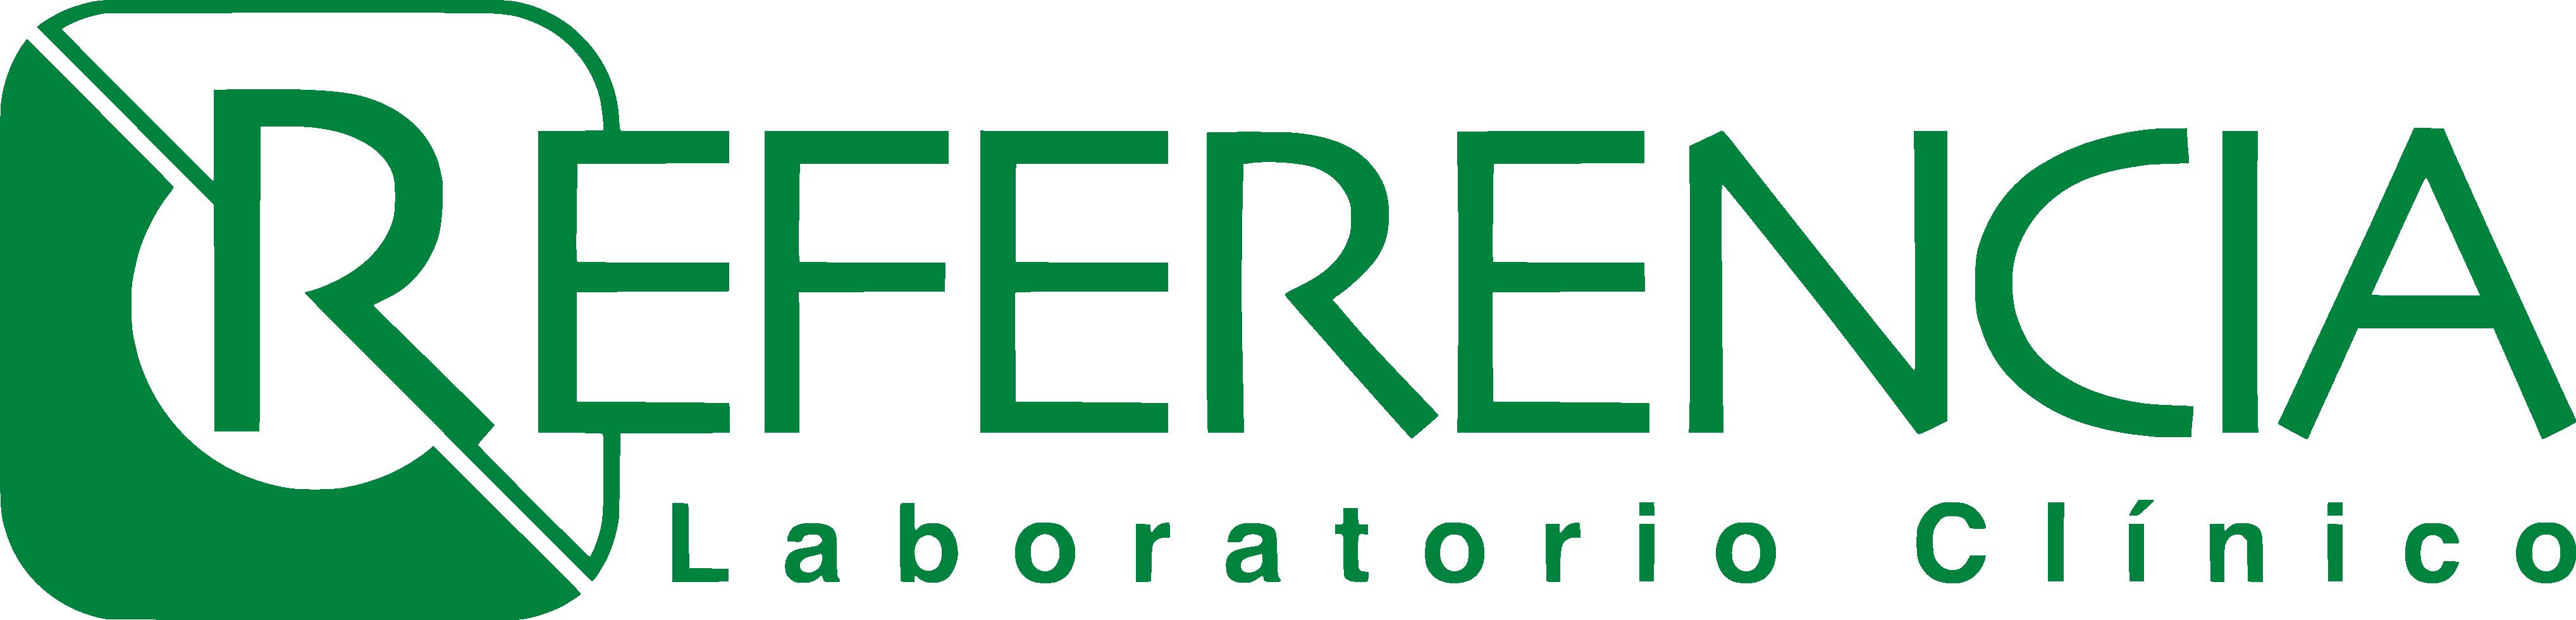 Logo Referencia Laboratorio Clínico